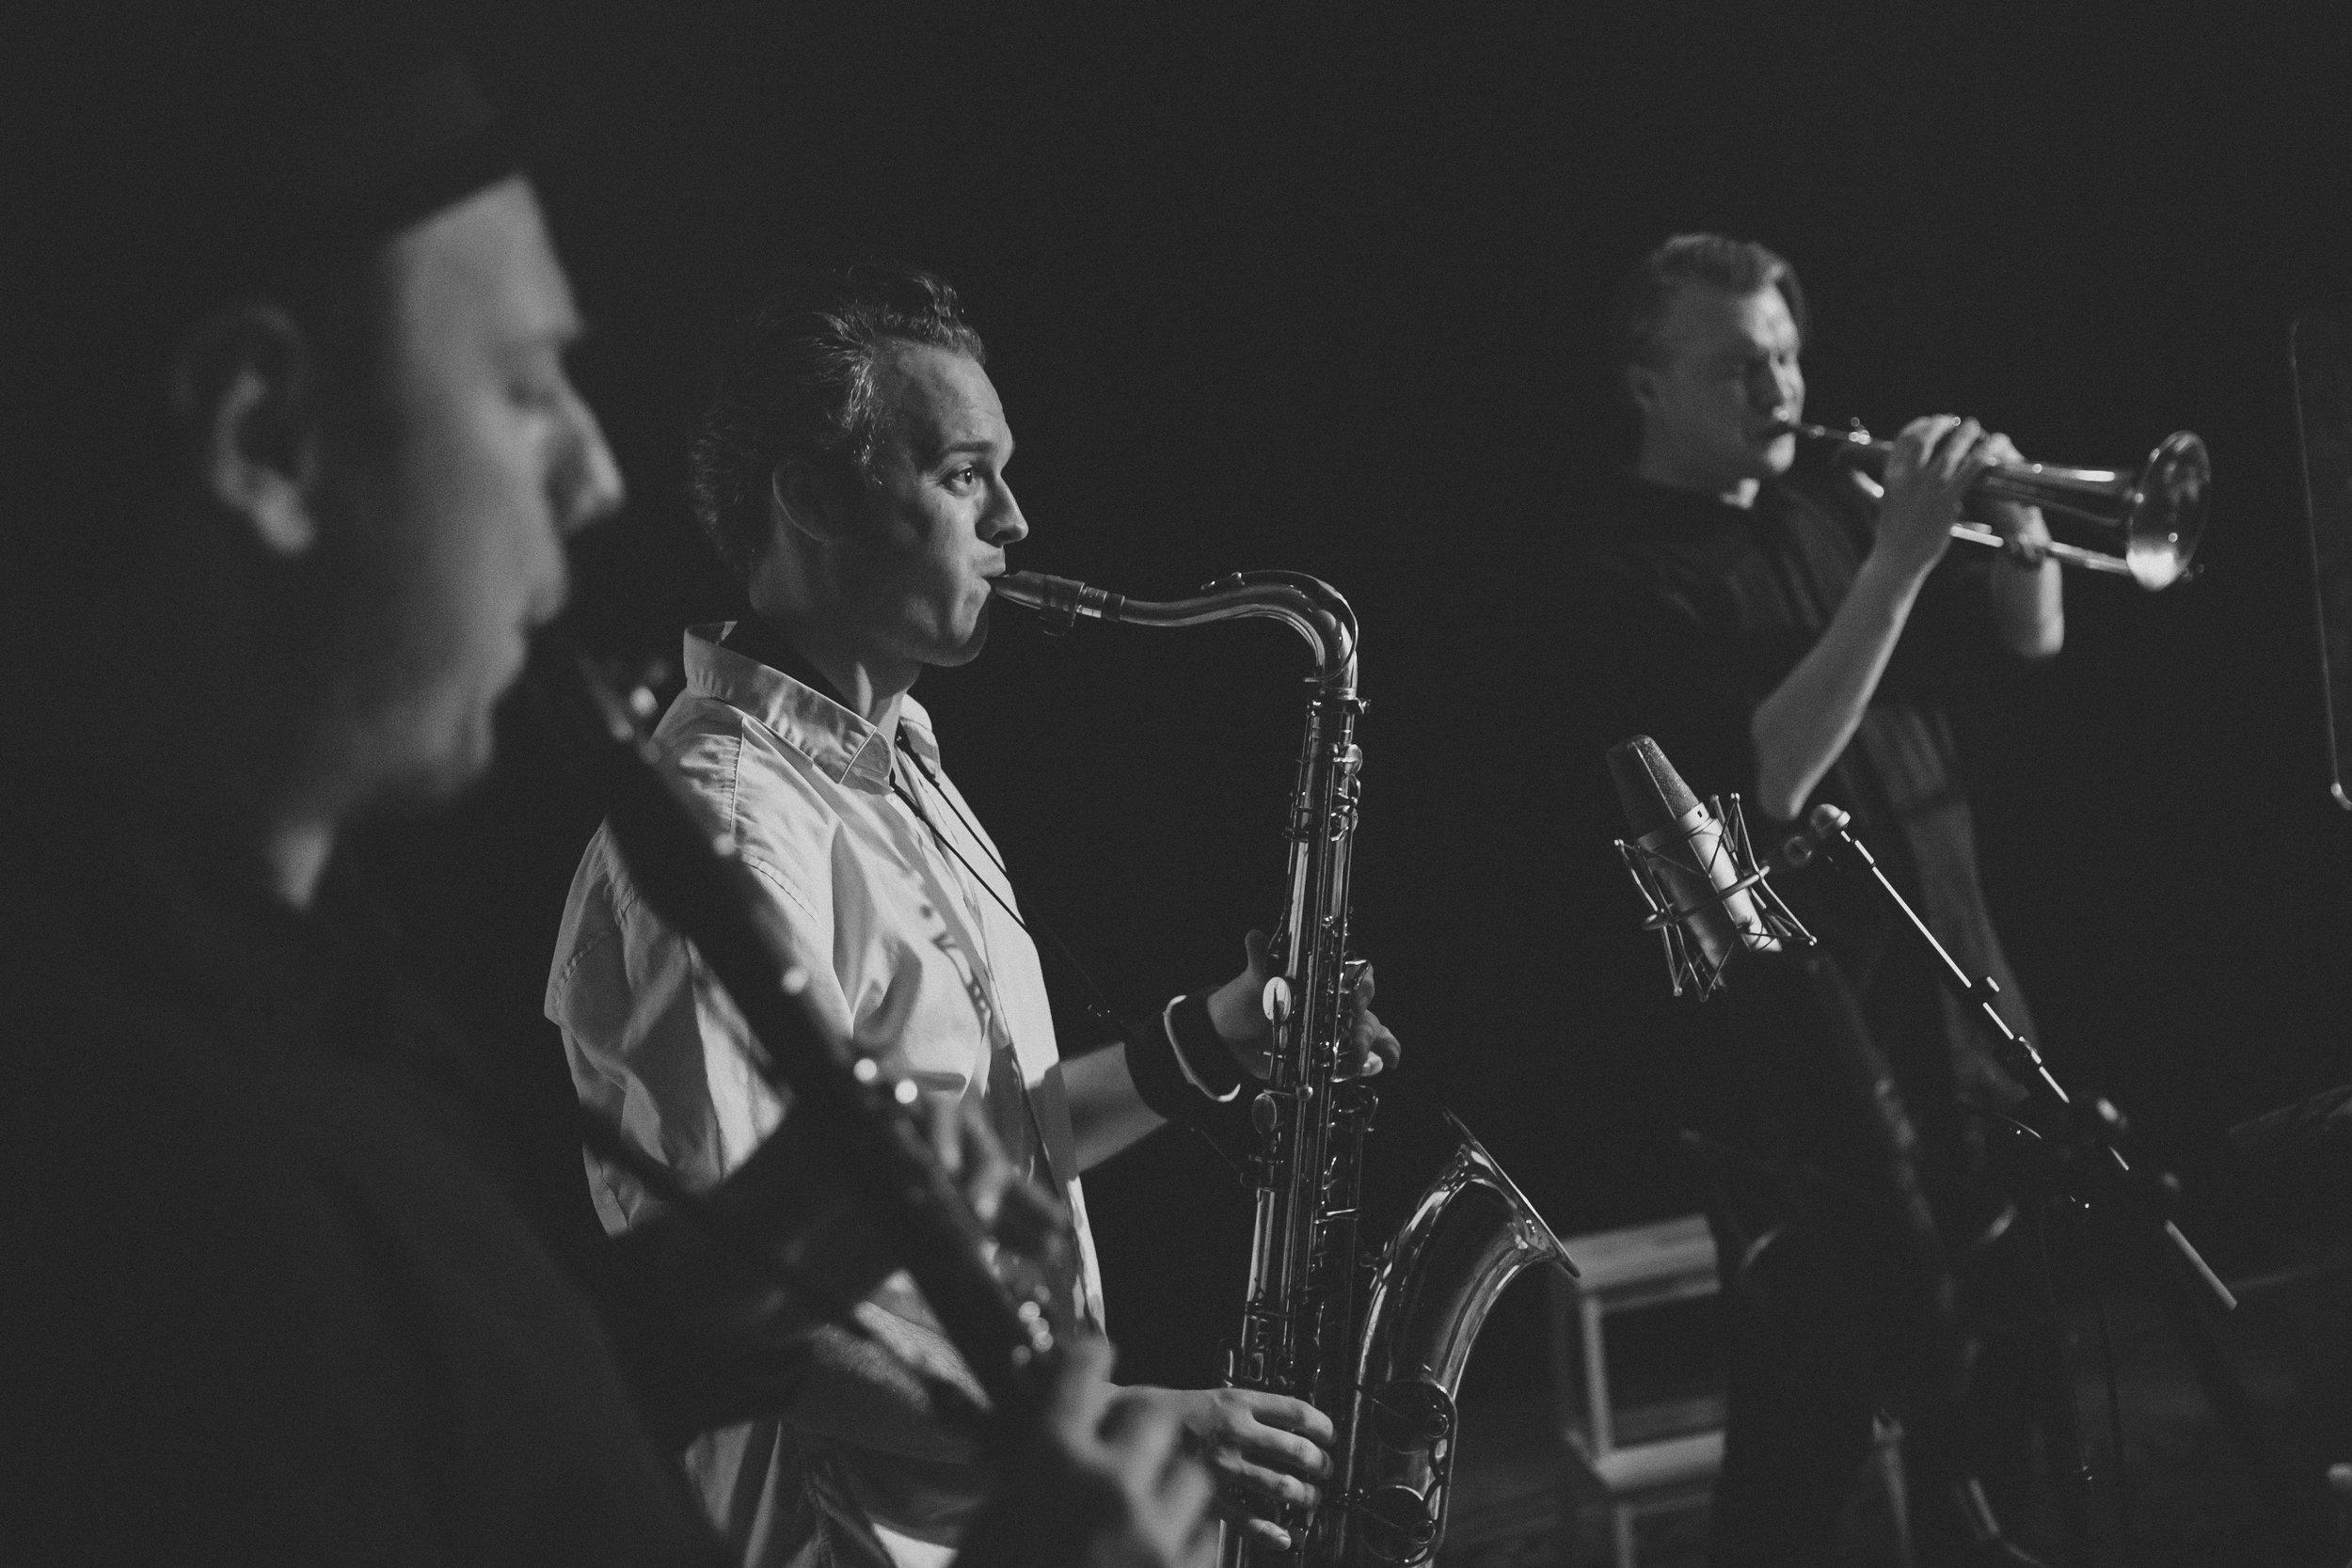 Mames Babagenush band members, from left: Emil Goldschmidt, clarinet; Lukas Rande, saxophone and Bo Rande, flügelhorn.